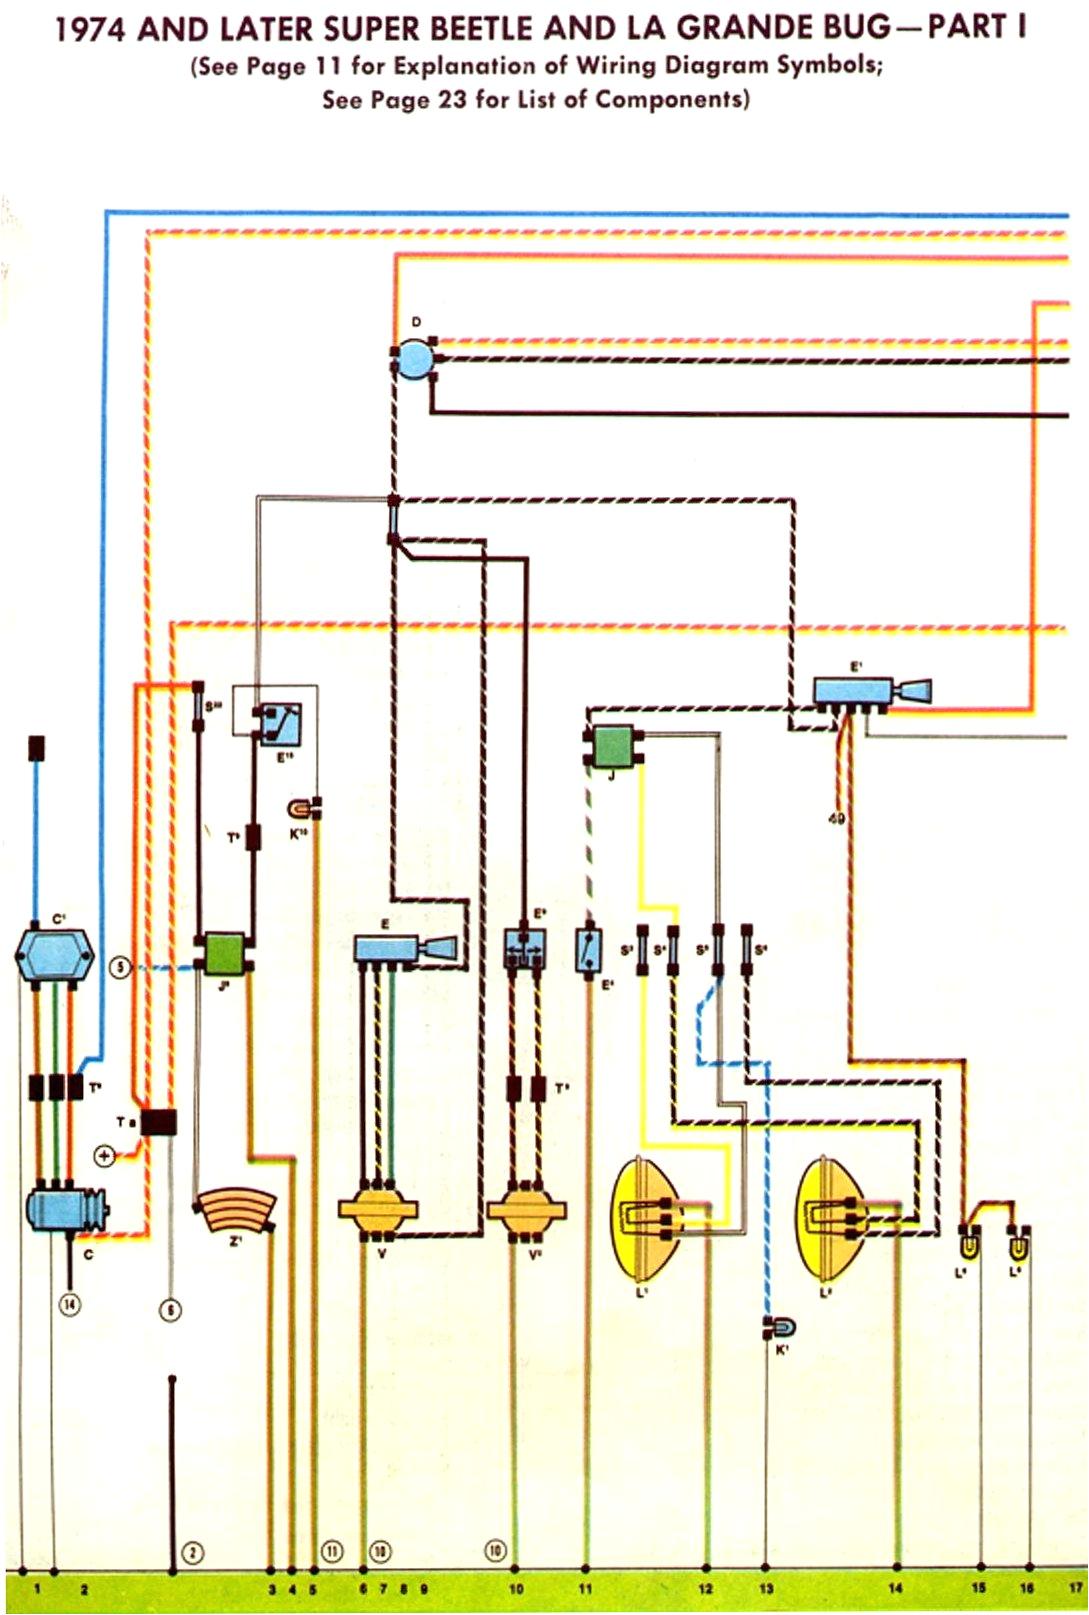 1974 75 super beetle wiring diagram thegoldenbug com fuse box wiring diagram for 1974 super beetle